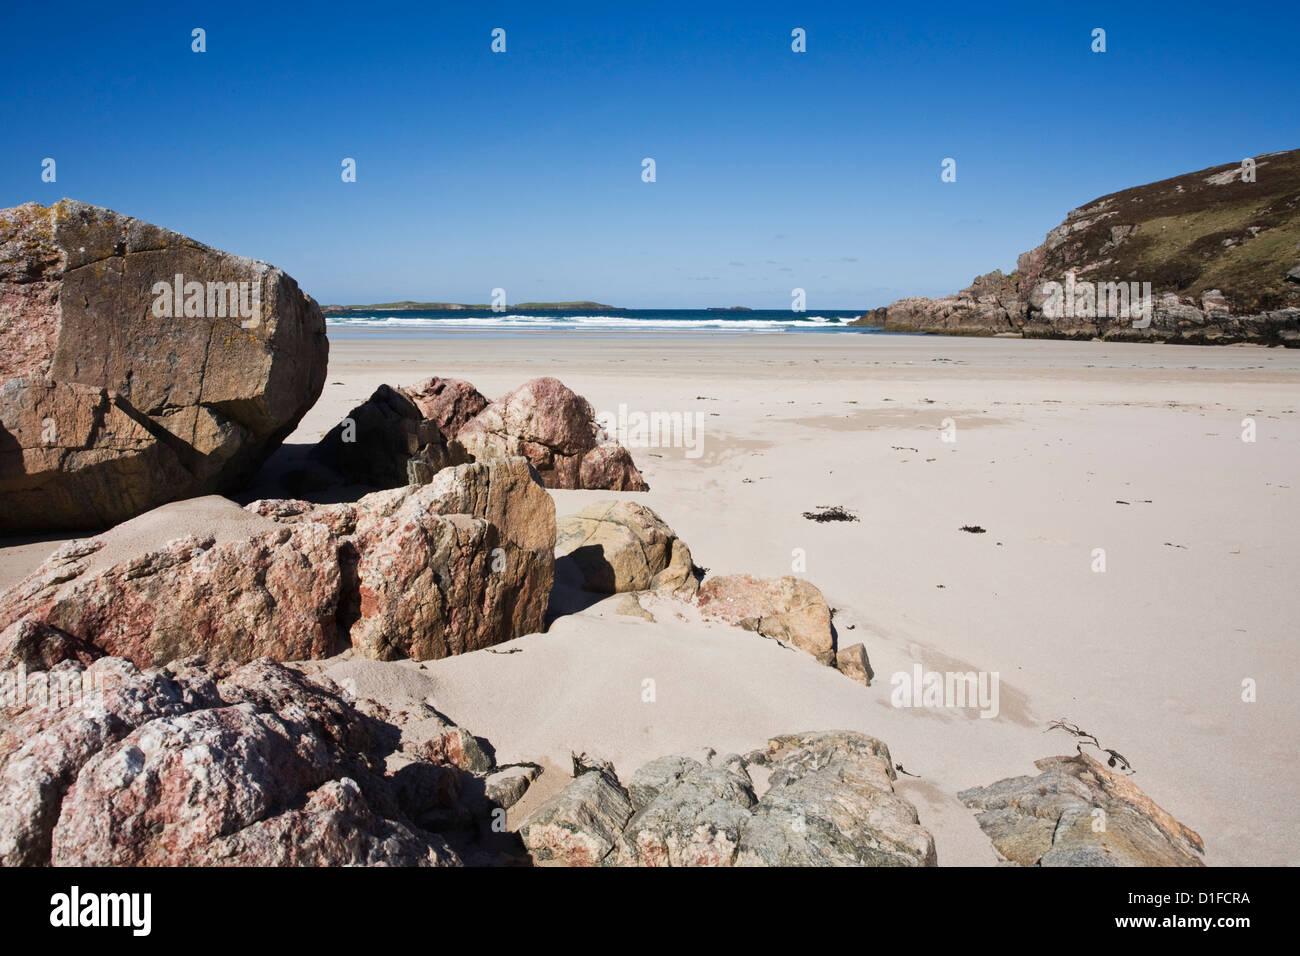 Ceannabeinne Bay, near Durness, Sutherland, Scotland, United Kingdom, Europe - Stock Image